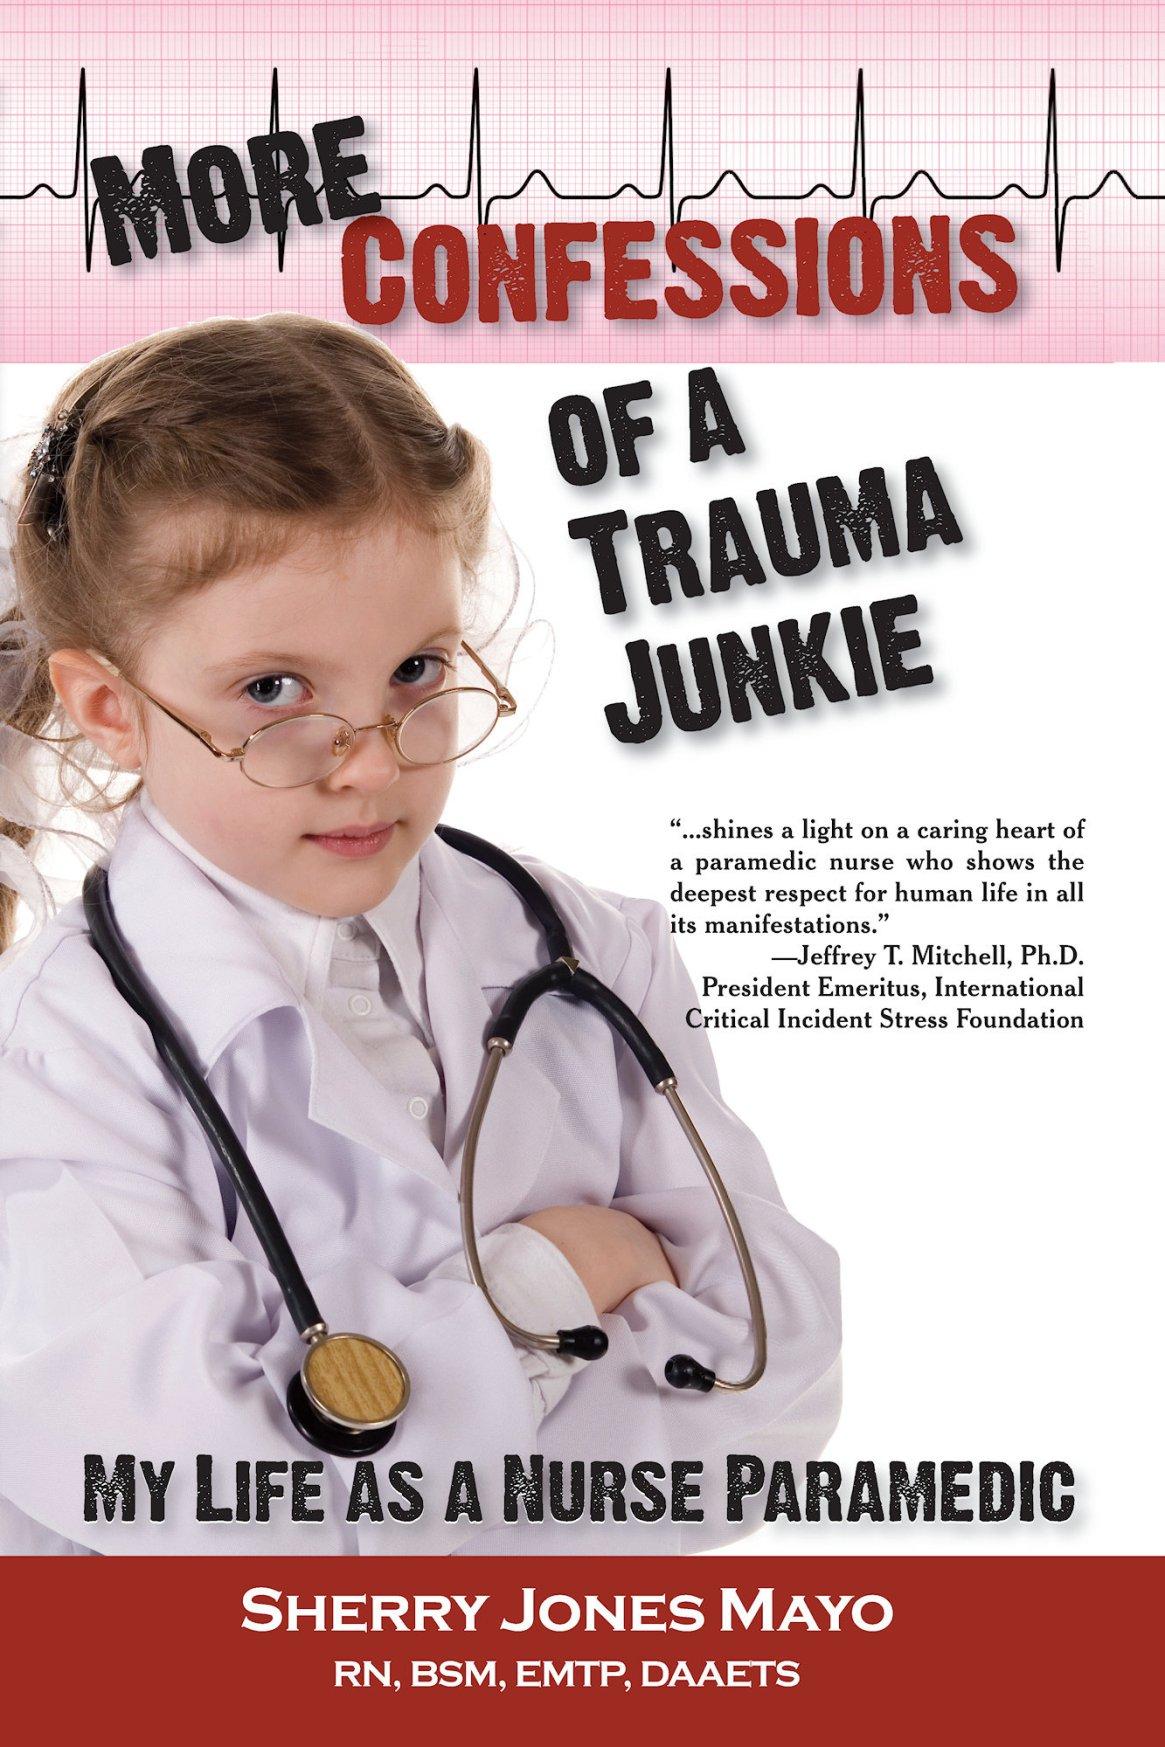 More Confessions of a Trauma Junkie: My Life as a Nurse Paramedic 978-1-61599-141-9